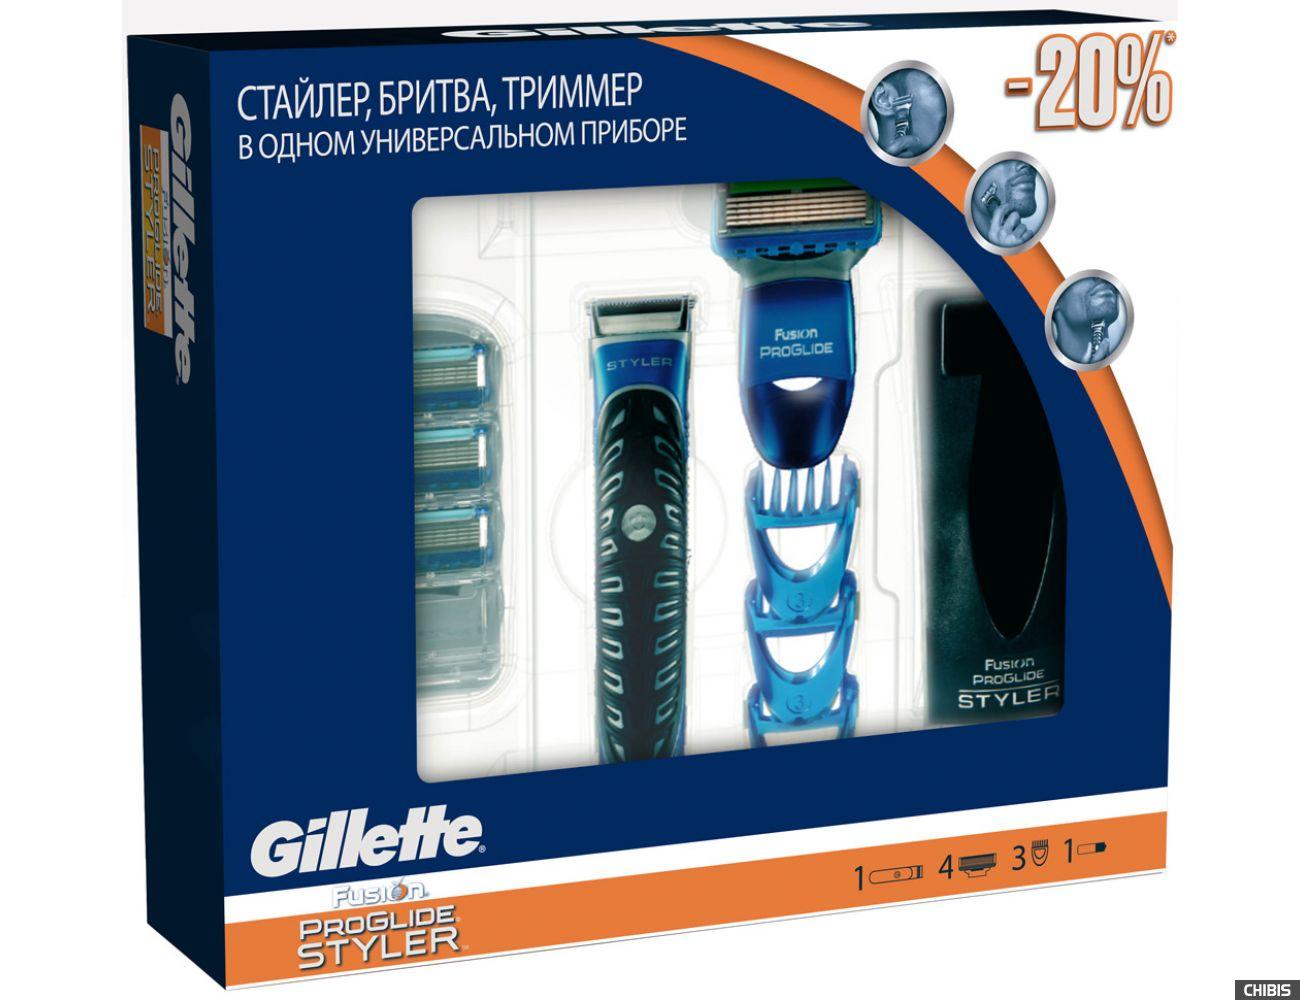 Gillette styler proglide Power триммер + 3 лезвия 7702018325023